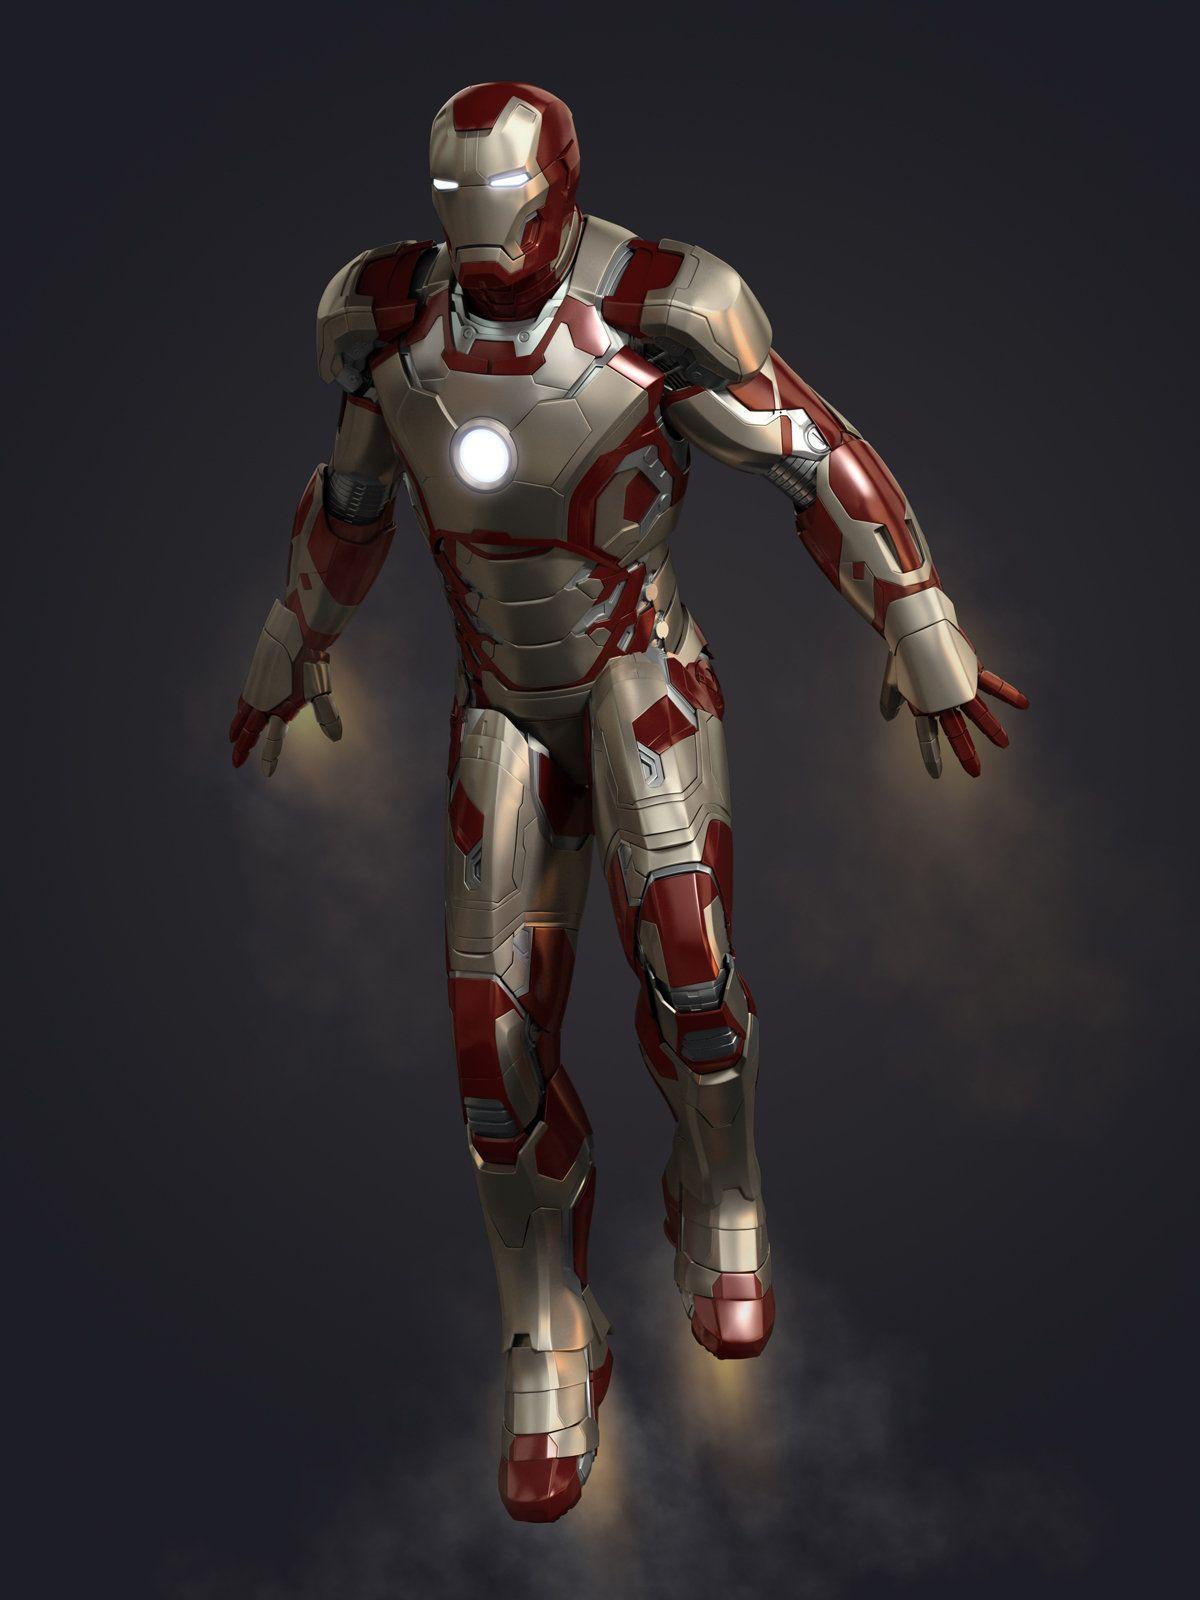 Iron Man 04 Liu Haifan Iron Man Iron Man Avengers Iron Man Armor